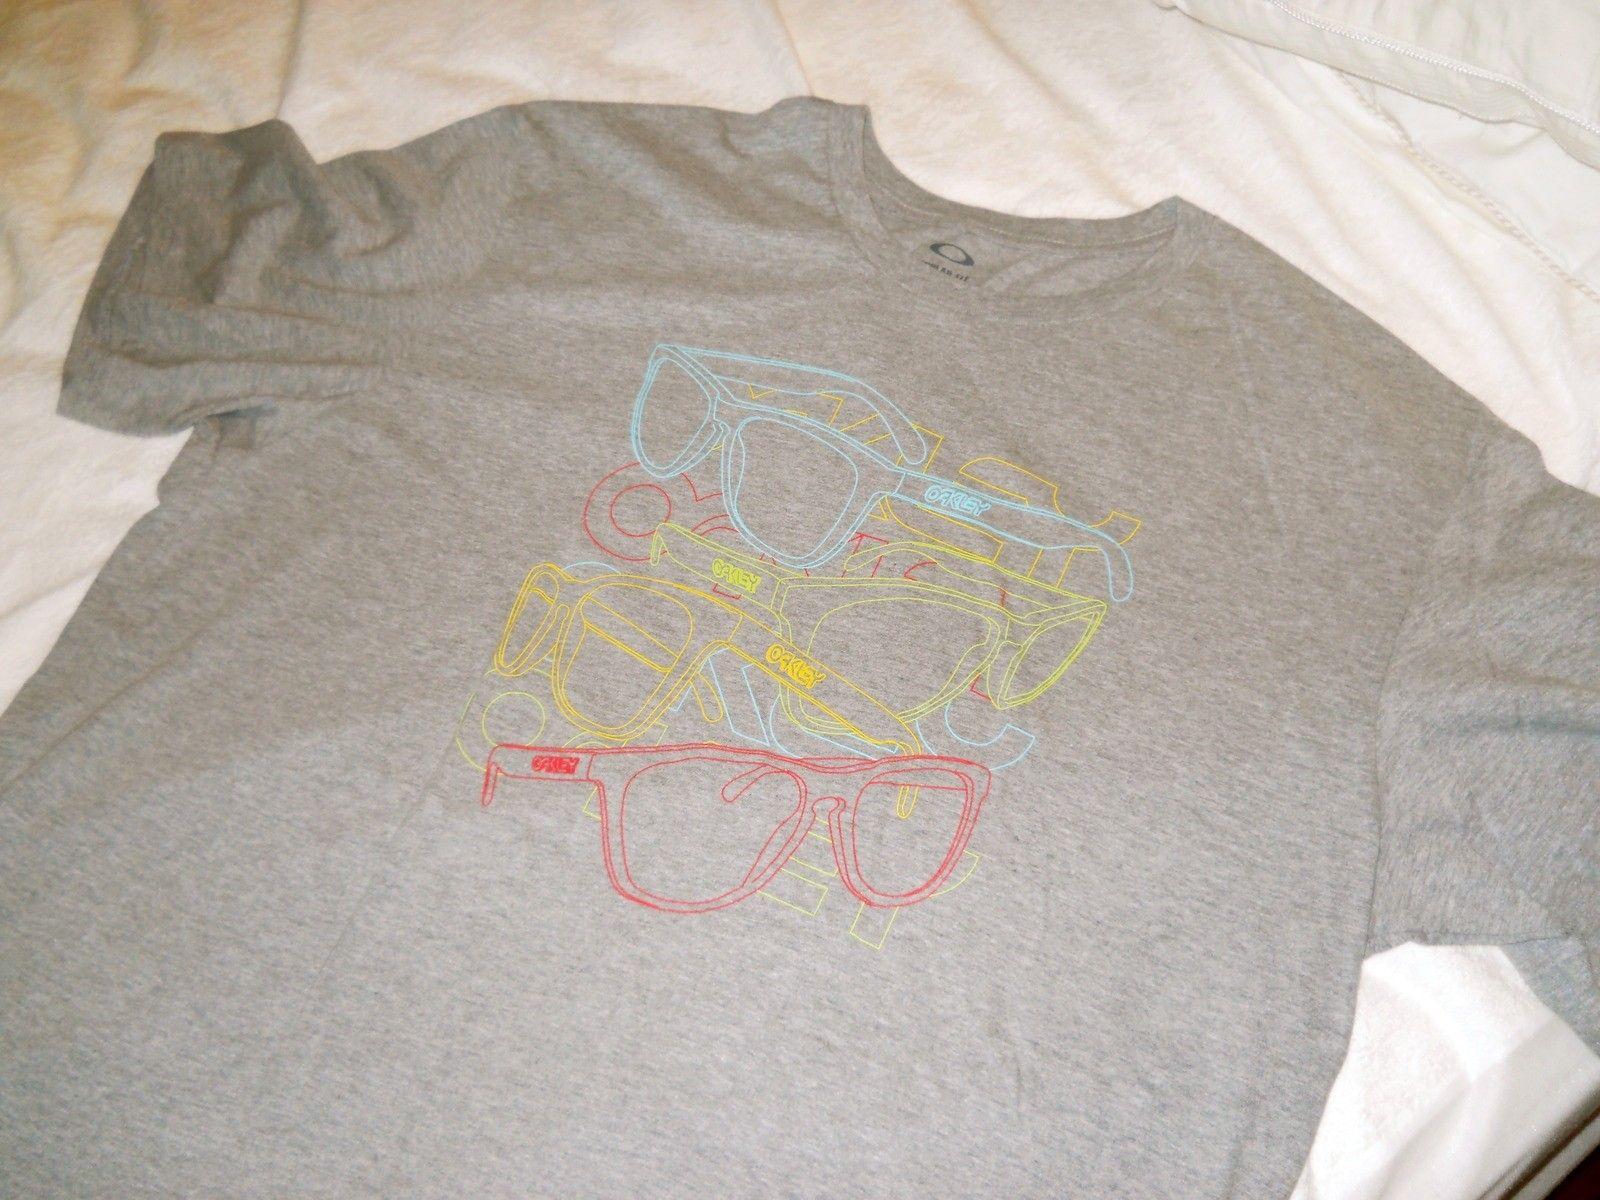 Frogskins Gray Tee Shirt - dscn0050k.jpg